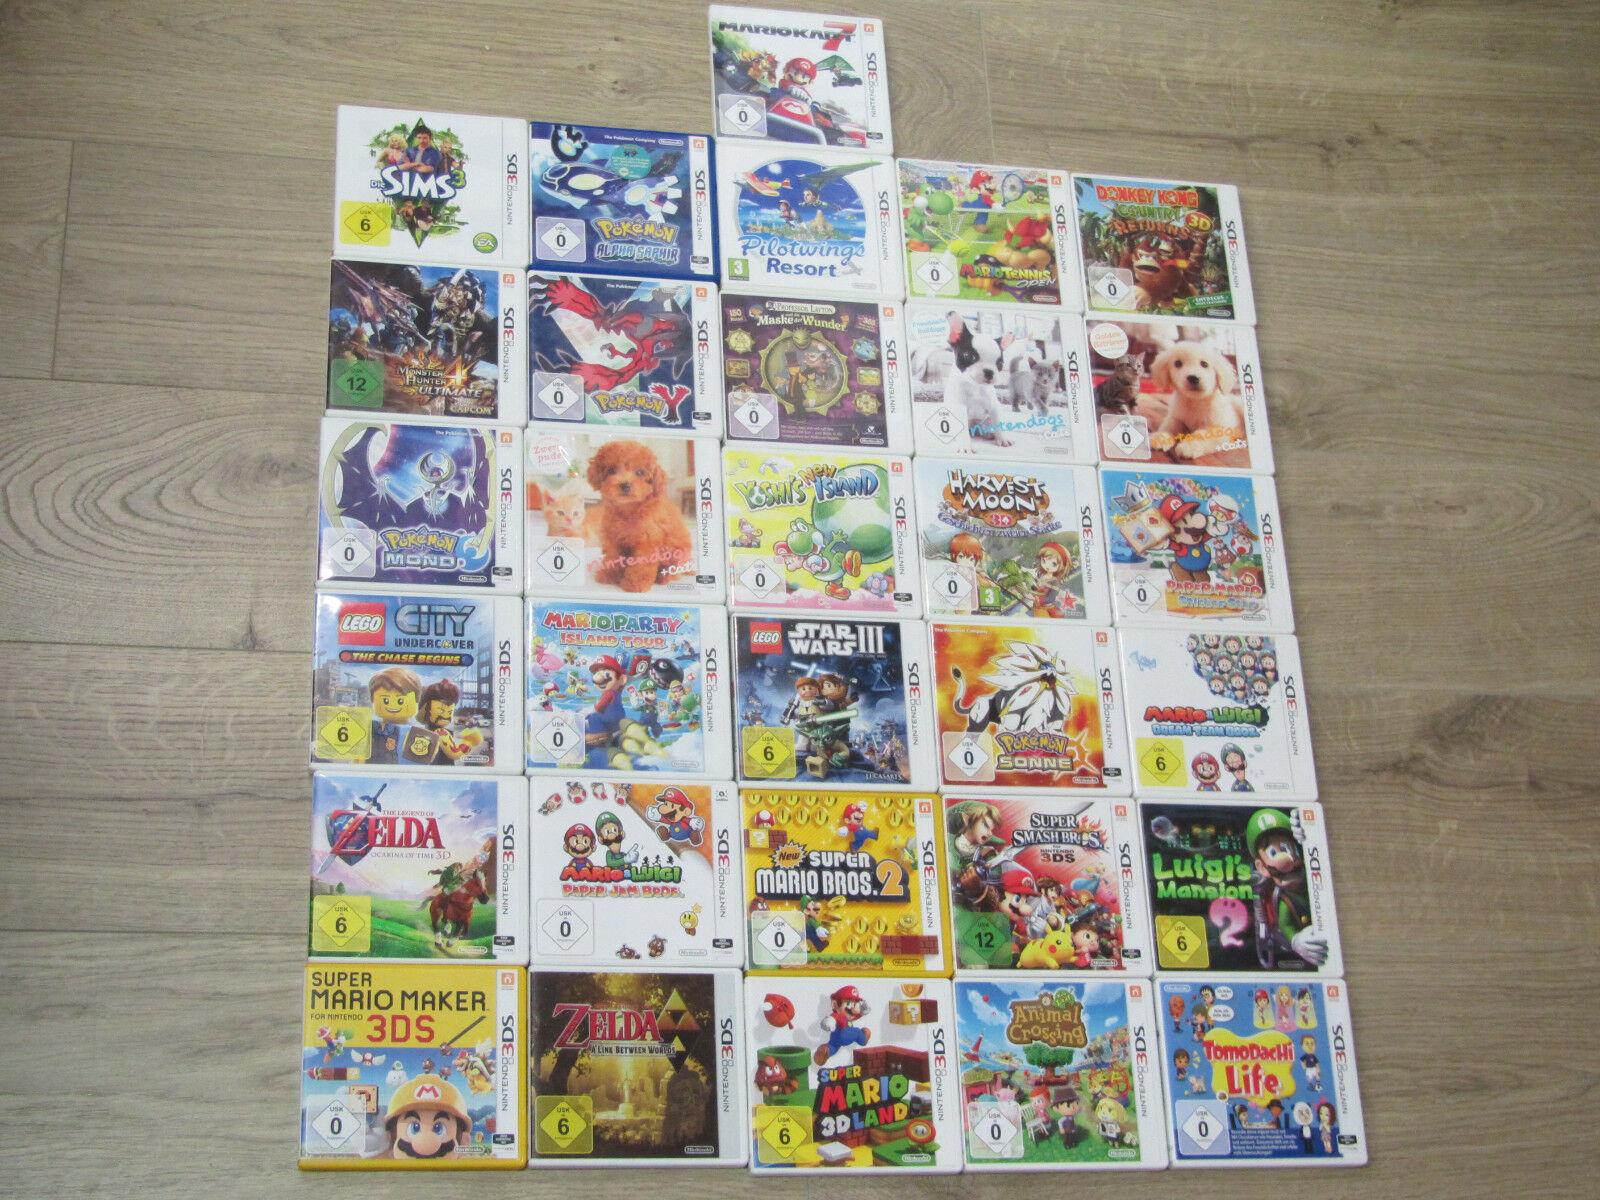 Nintendo 3DS Spiele Zelda, New Mario Kart, Smash Bros. Pokemon, Nintendogs